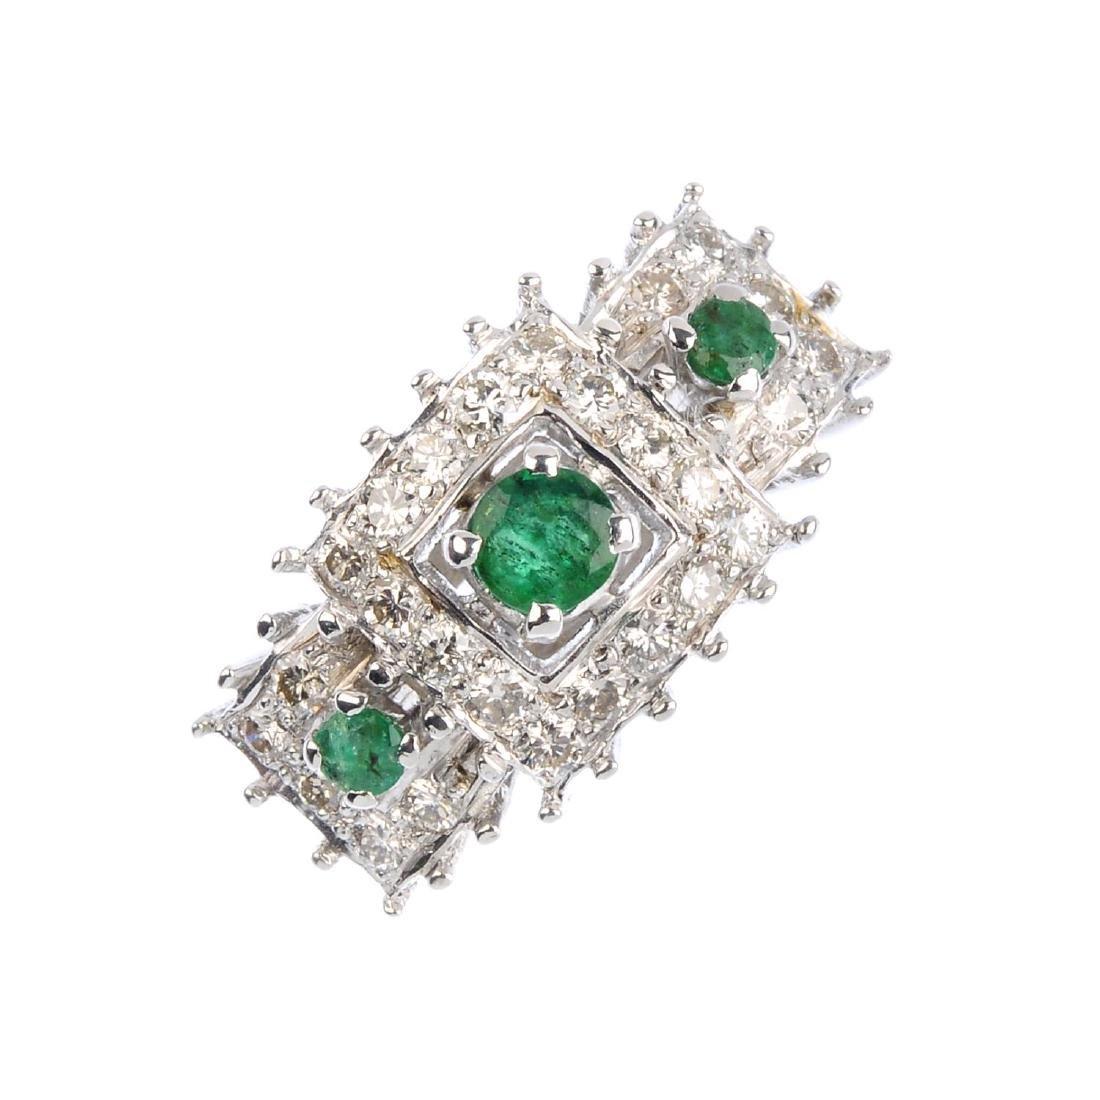 An emerald and diamond dress ring. The circular-shape